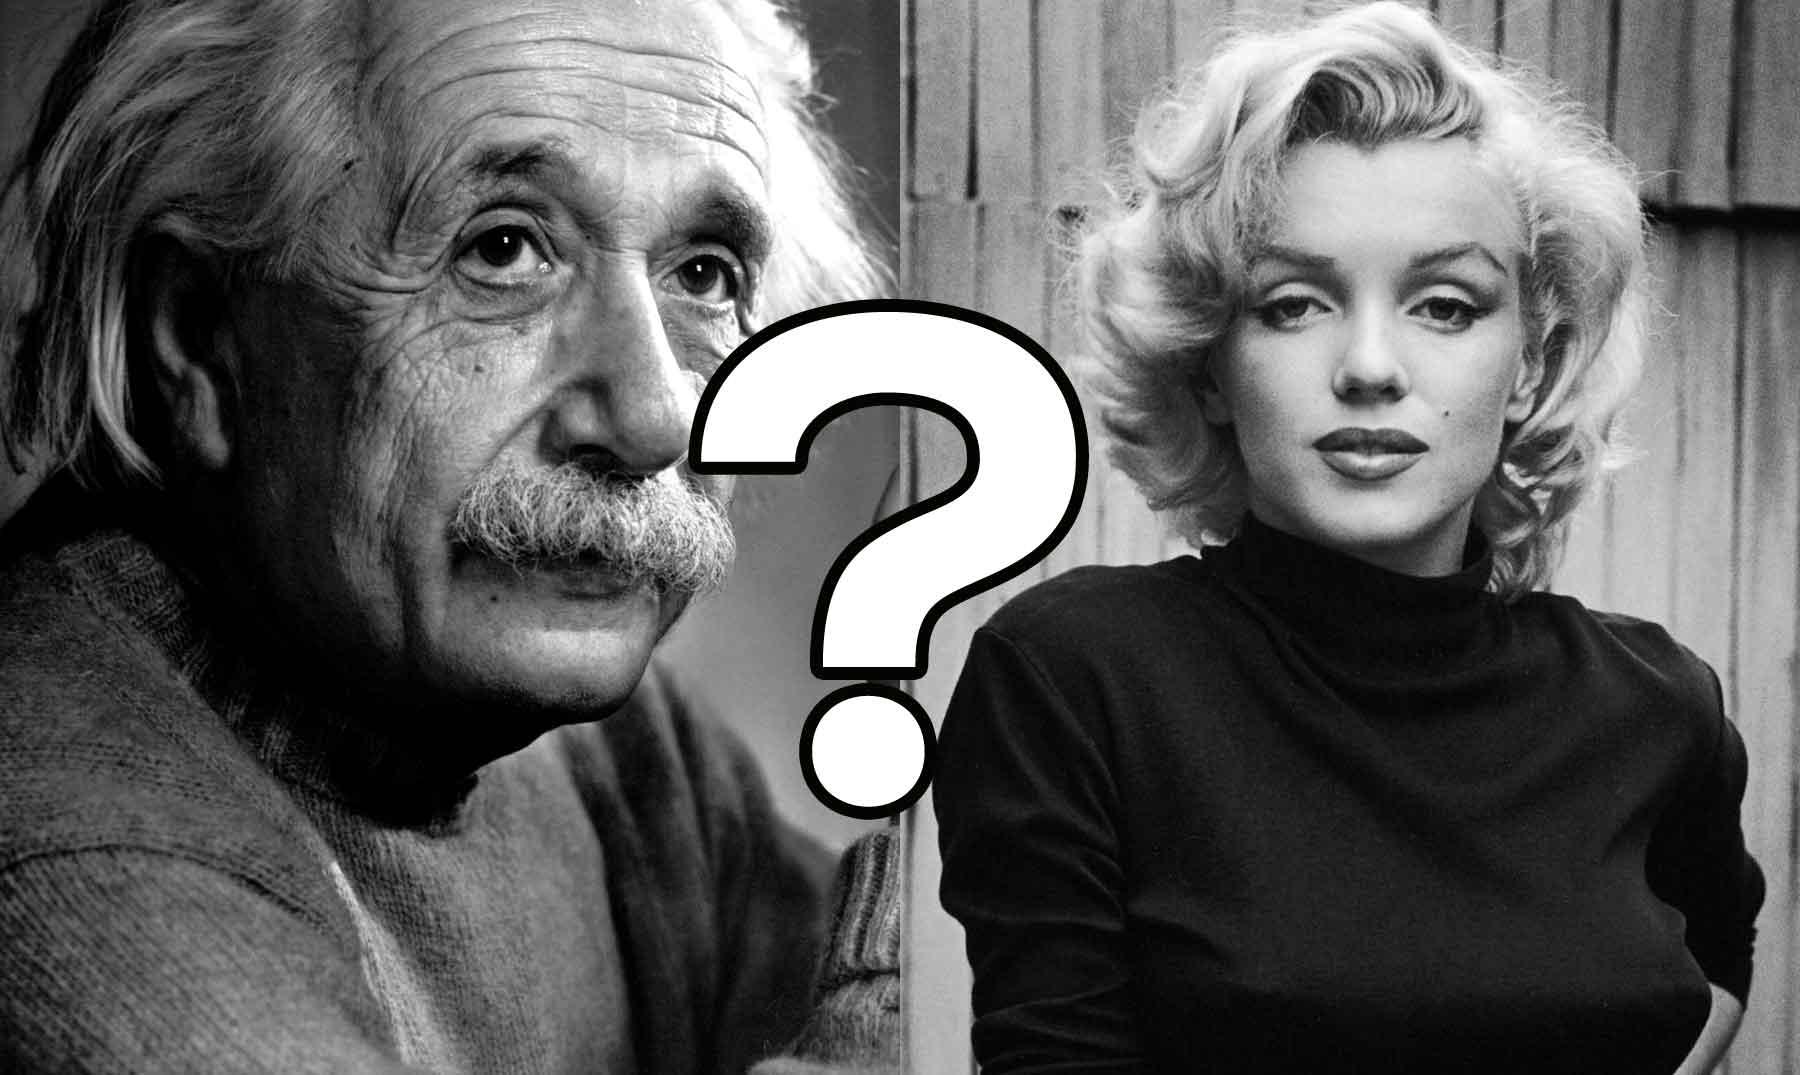 Qué le propuso Marilyn Monroe a Albert Einstein?